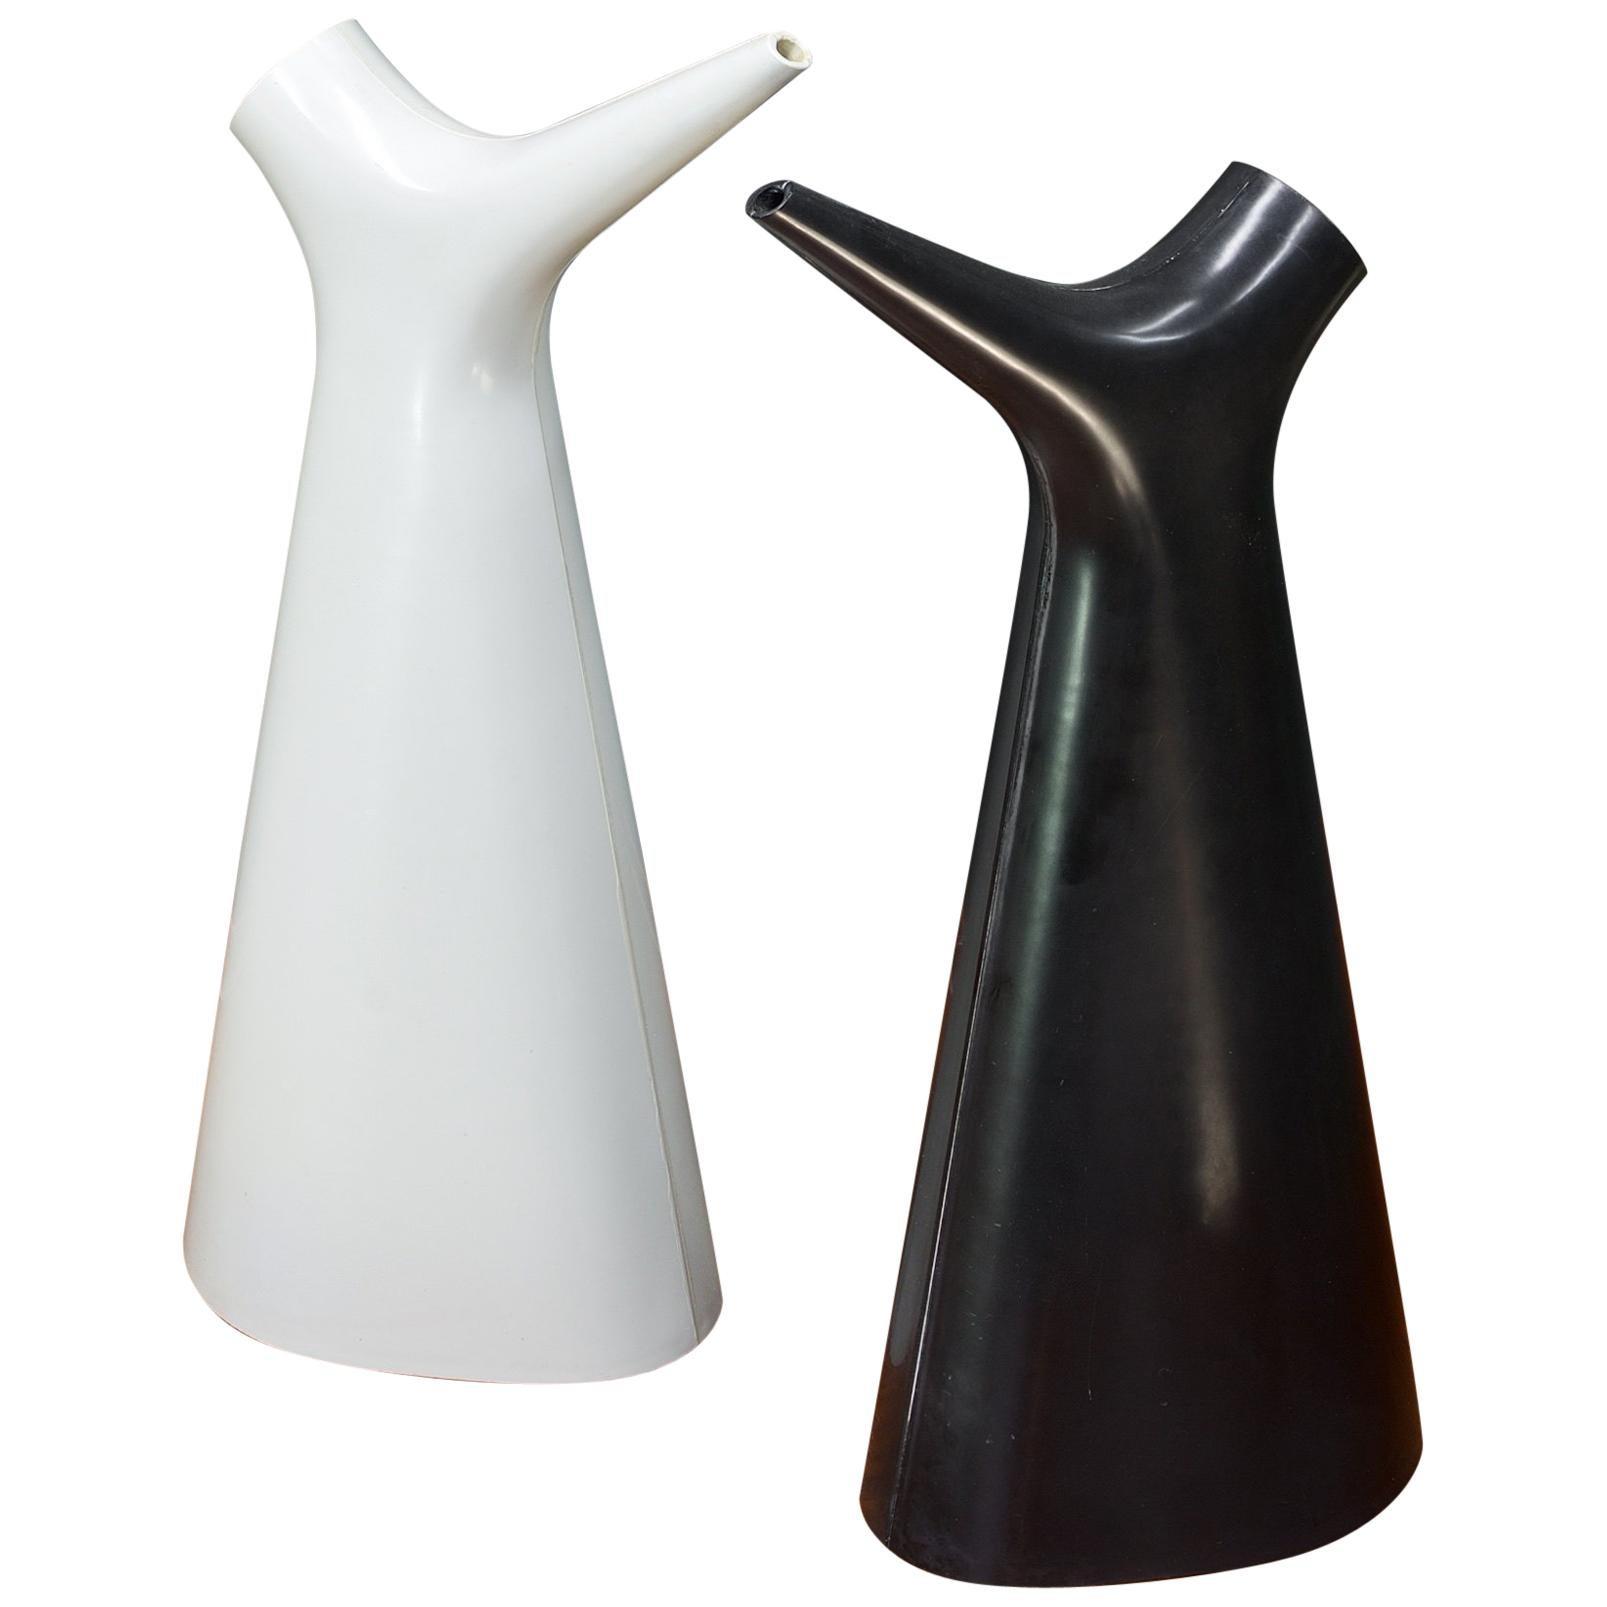 Carl-arne Breger Plastic Watering Cans Pitchers Gustavsberg Sweden Black White